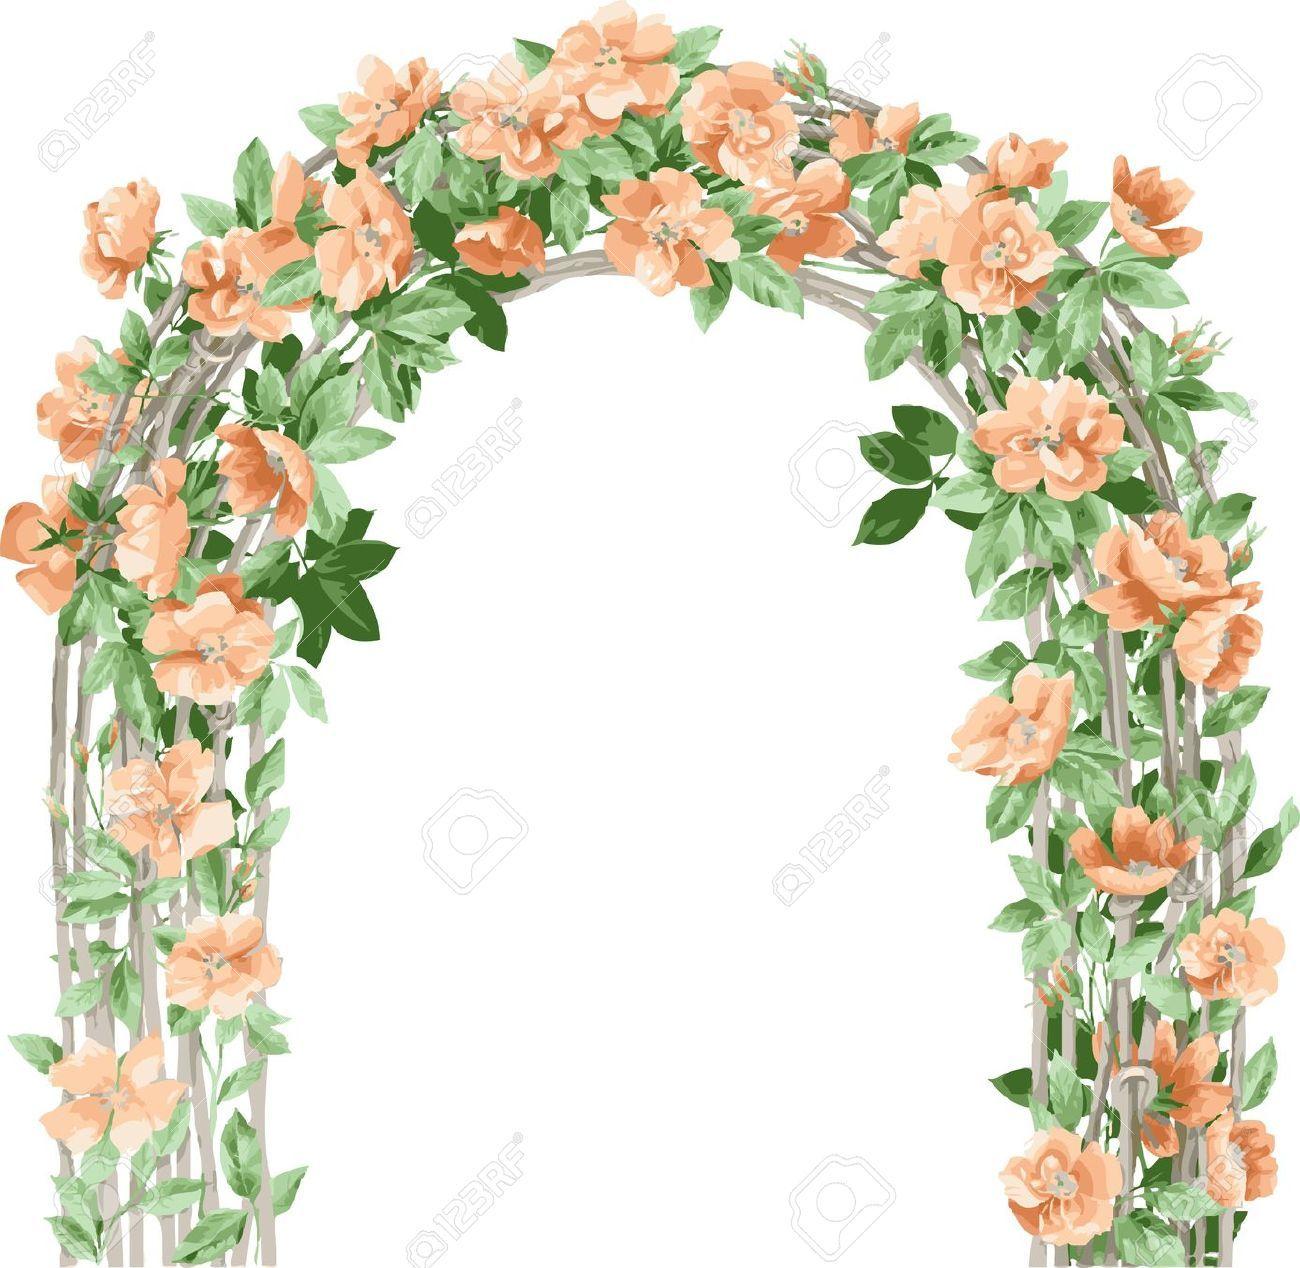 Gate clipart flower. Clip art arts for